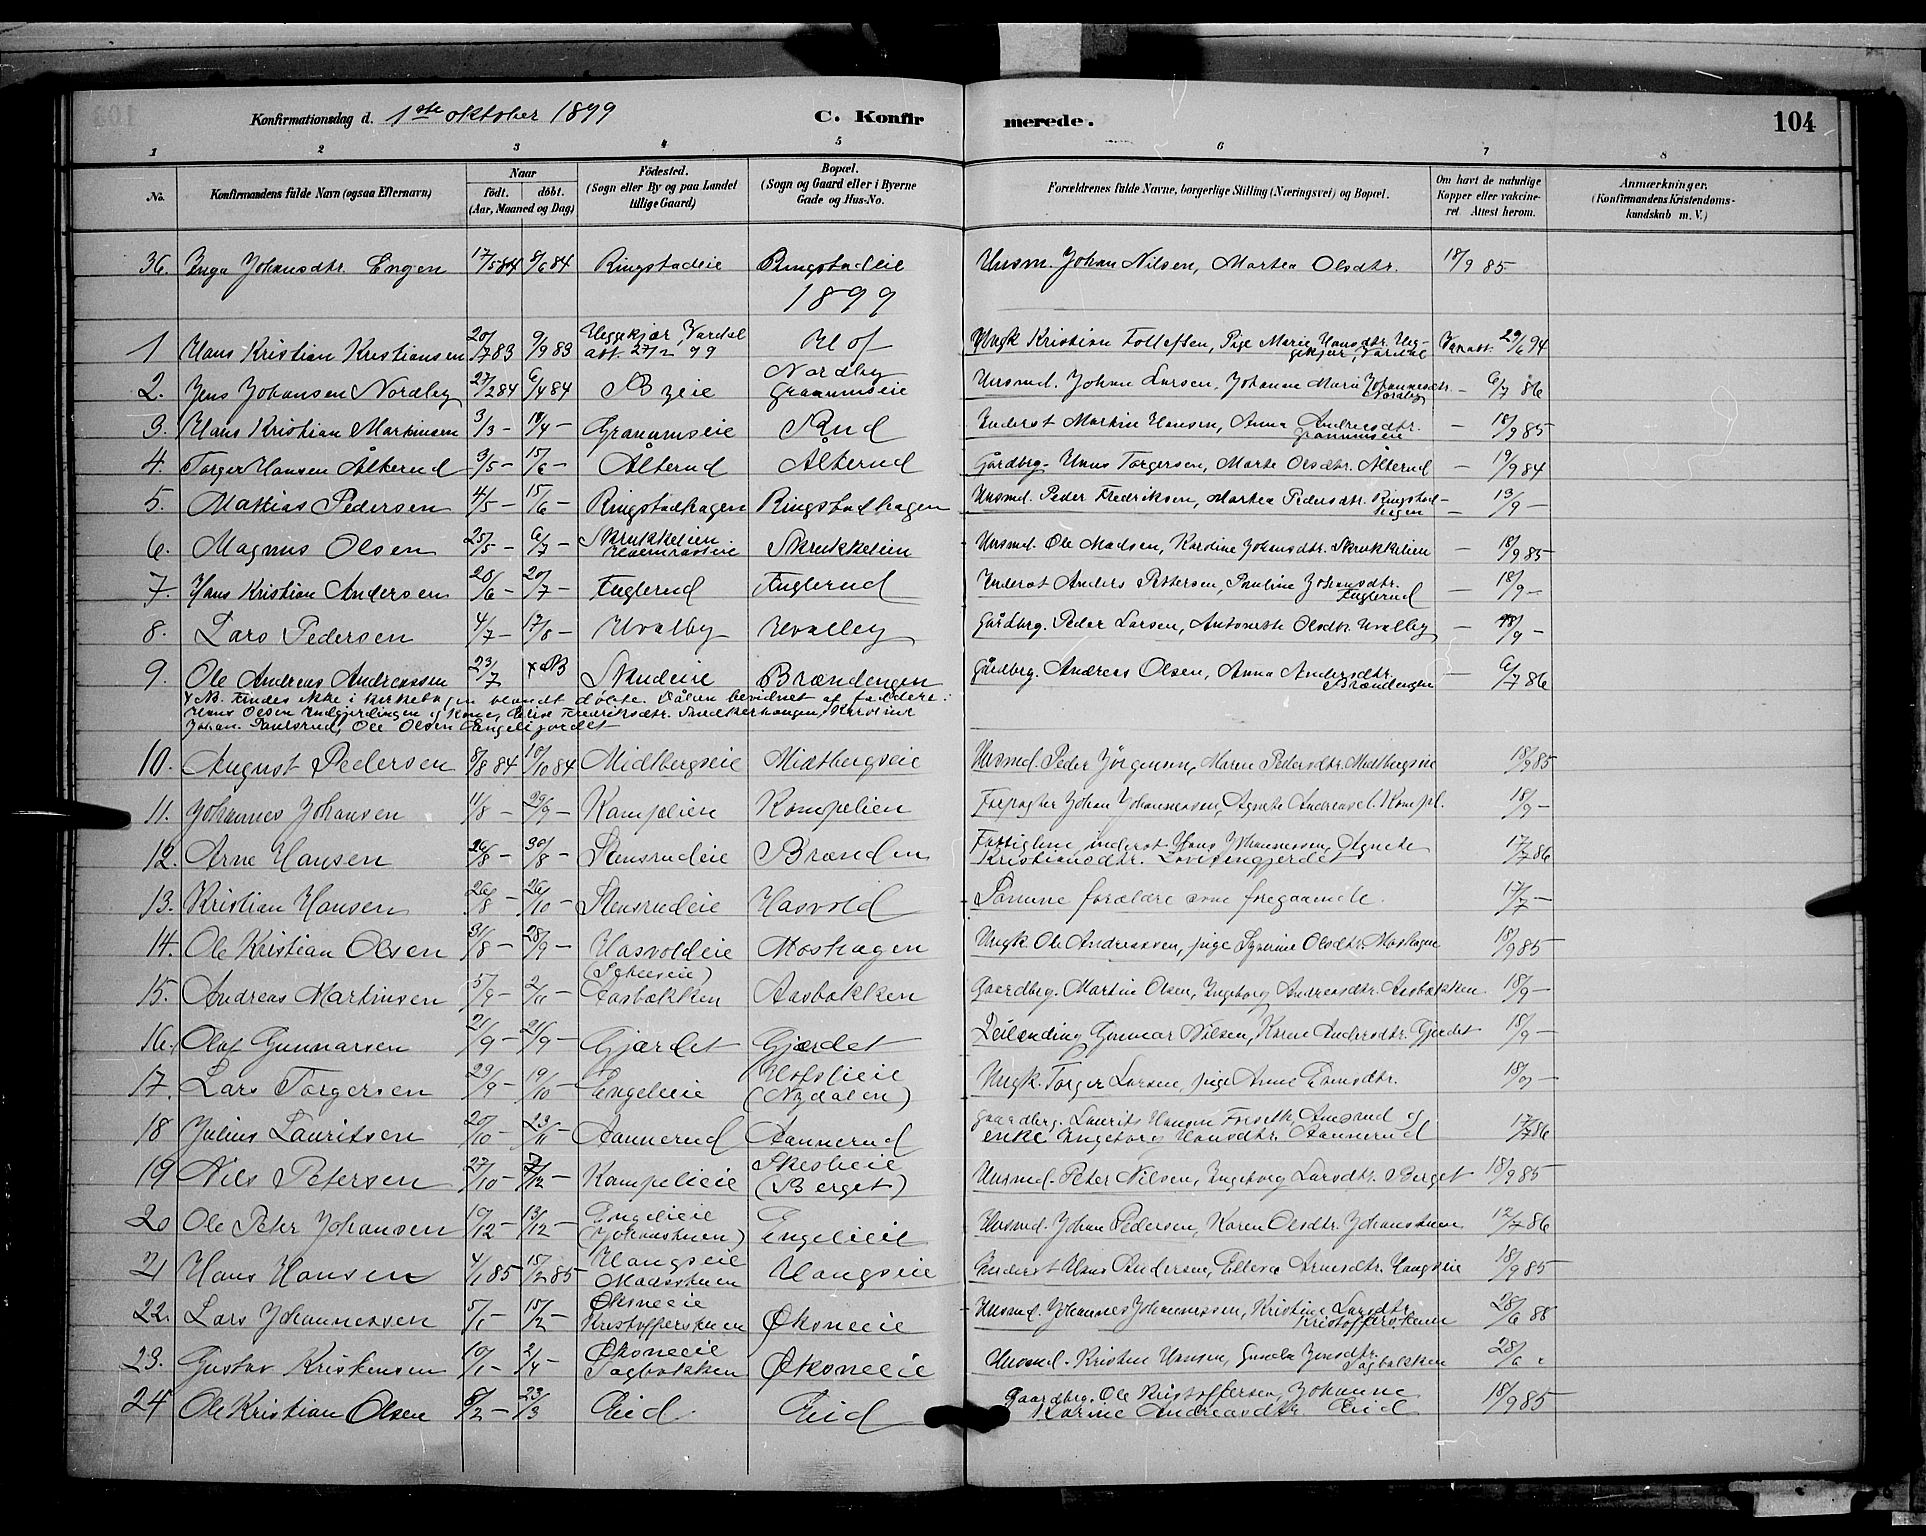 SAH, Søndre Land prestekontor, L/L0002: Klokkerbok nr. 2, 1884-1900, s. 104